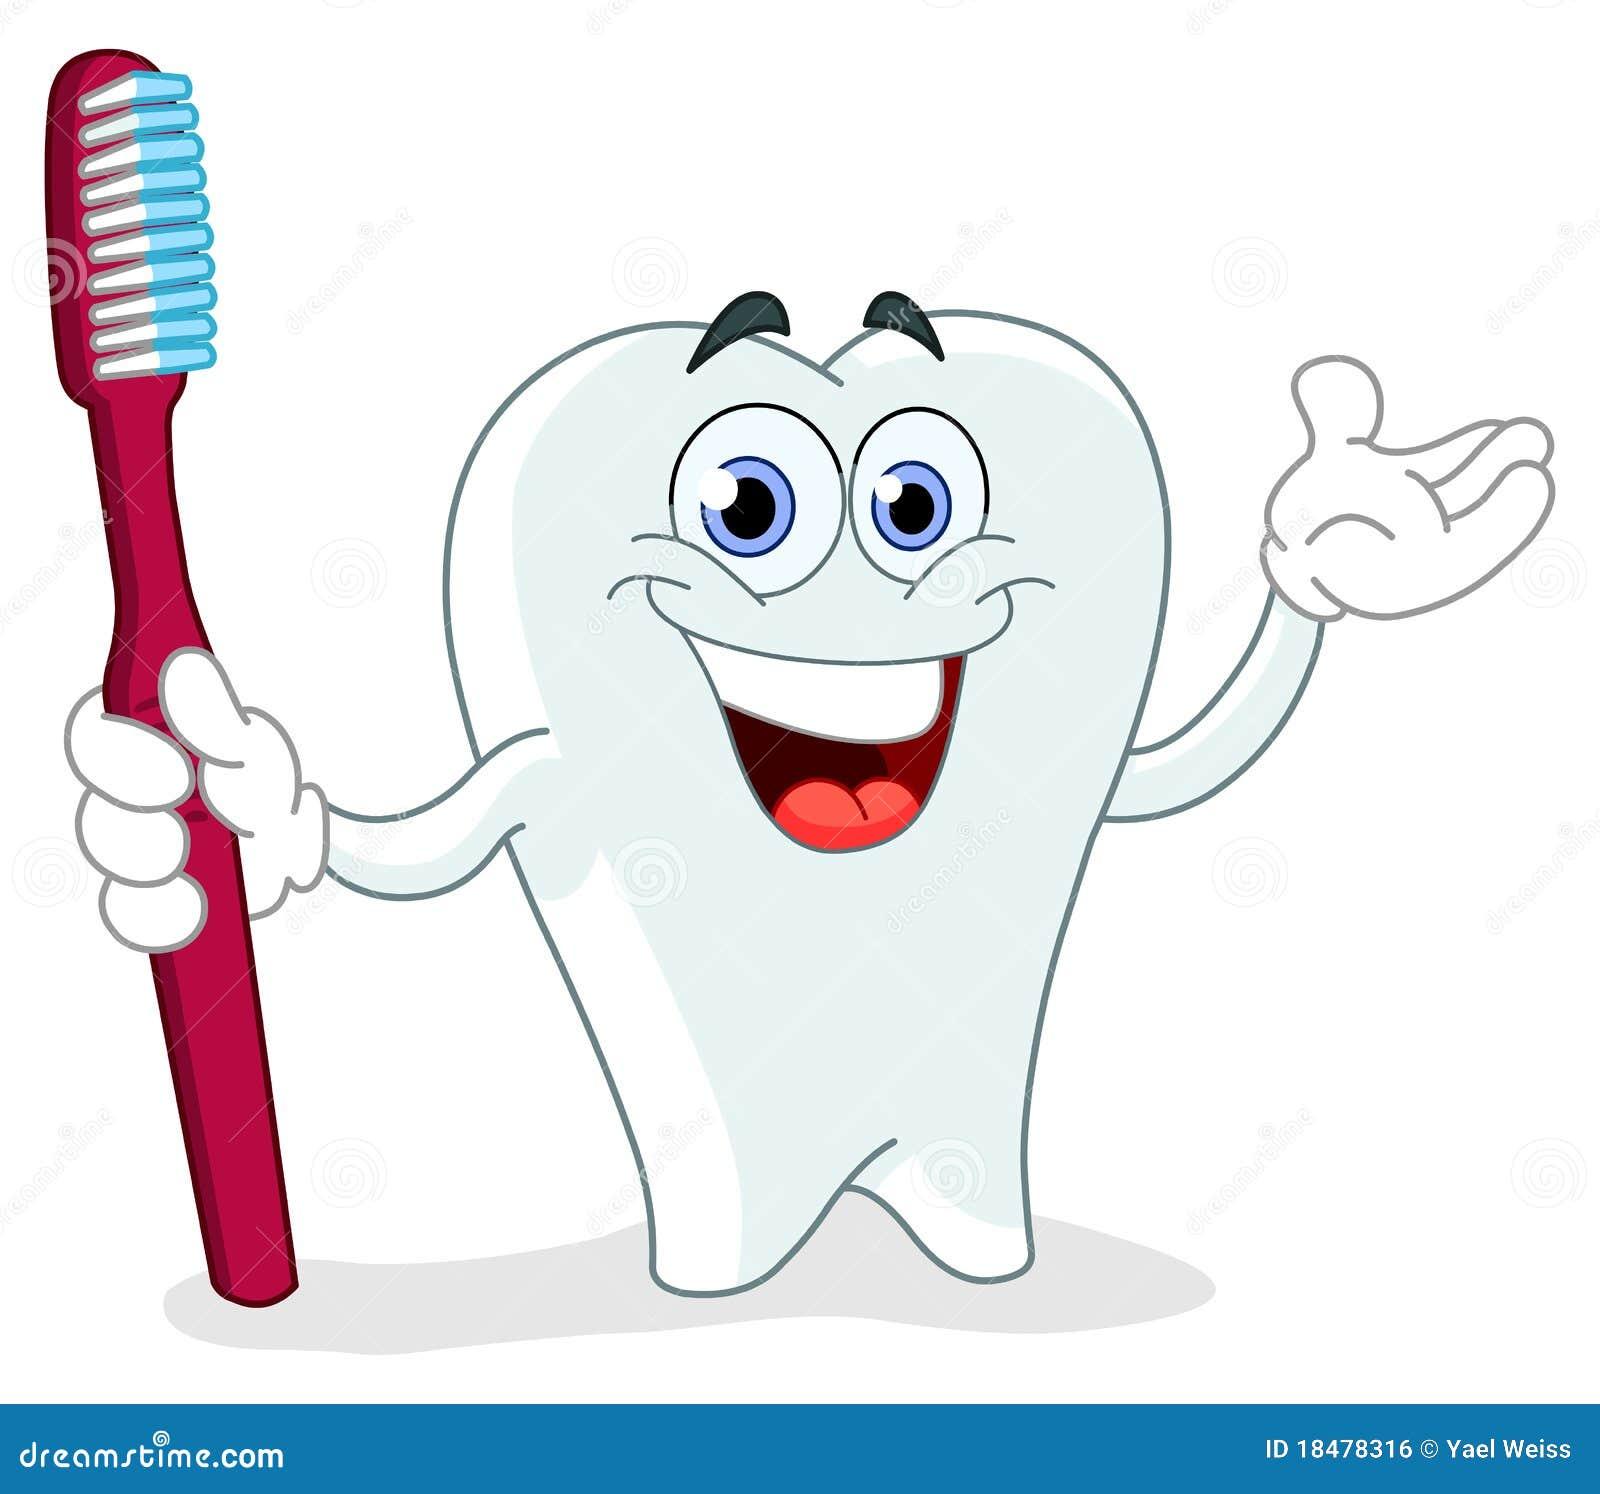 dent de dessin anim avec la brosse dents illustration de vecteur illustration du dr le. Black Bedroom Furniture Sets. Home Design Ideas